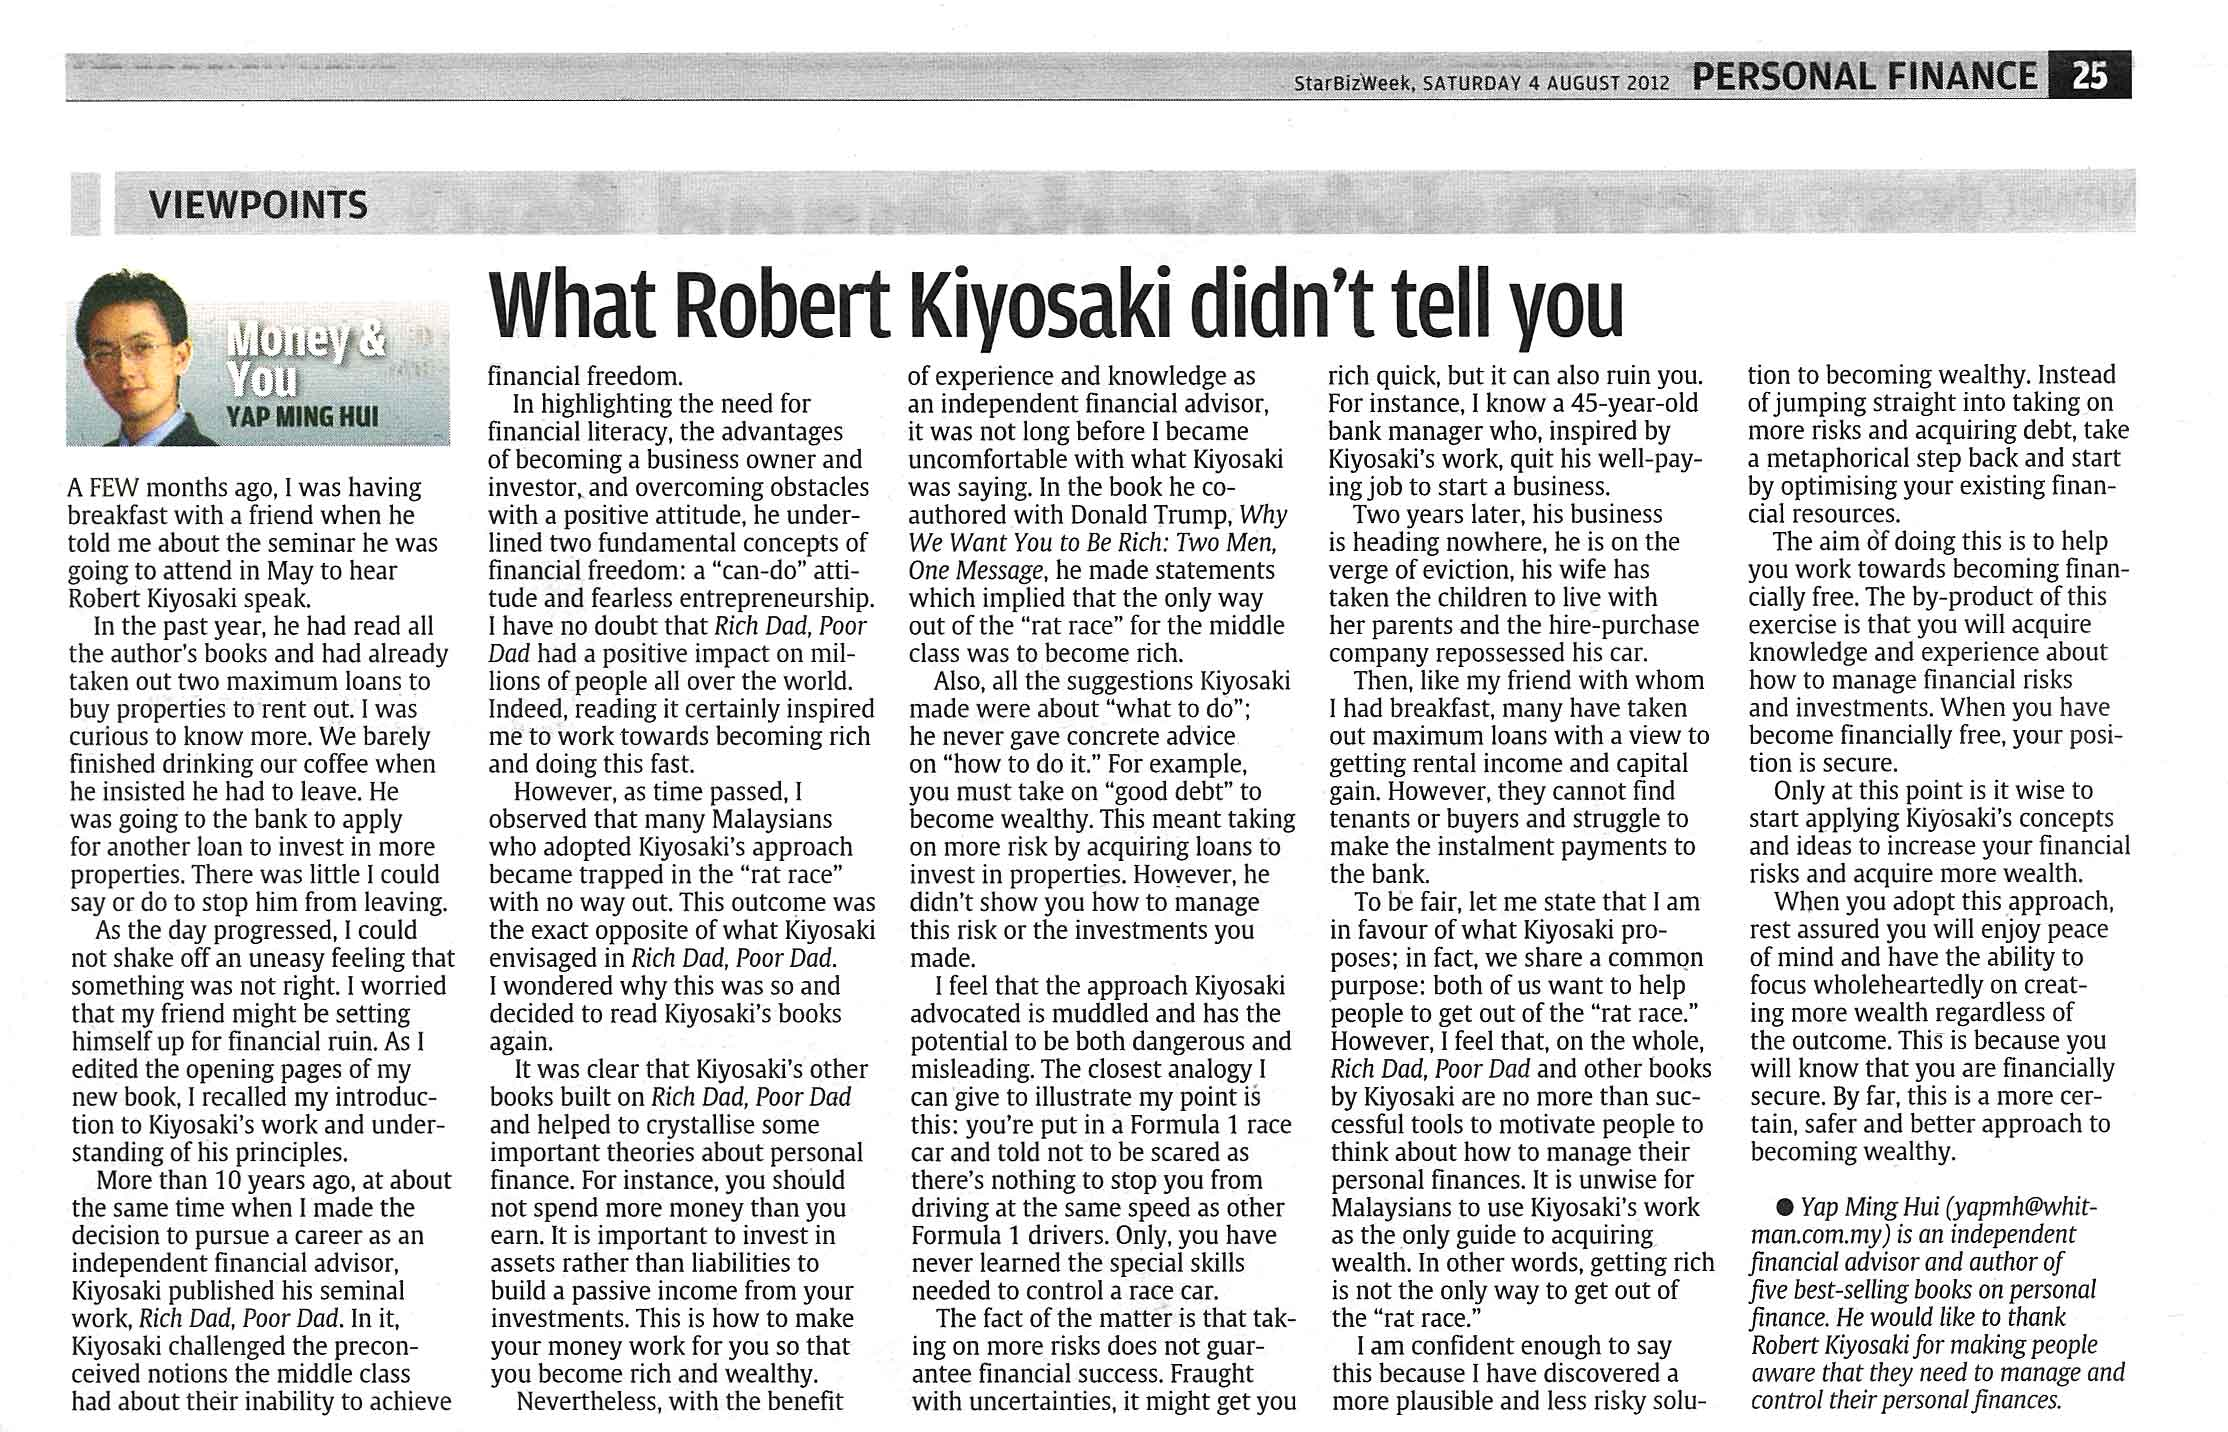 What Robert Kiyosaki Didn't Tell You - 04 Aug 2012